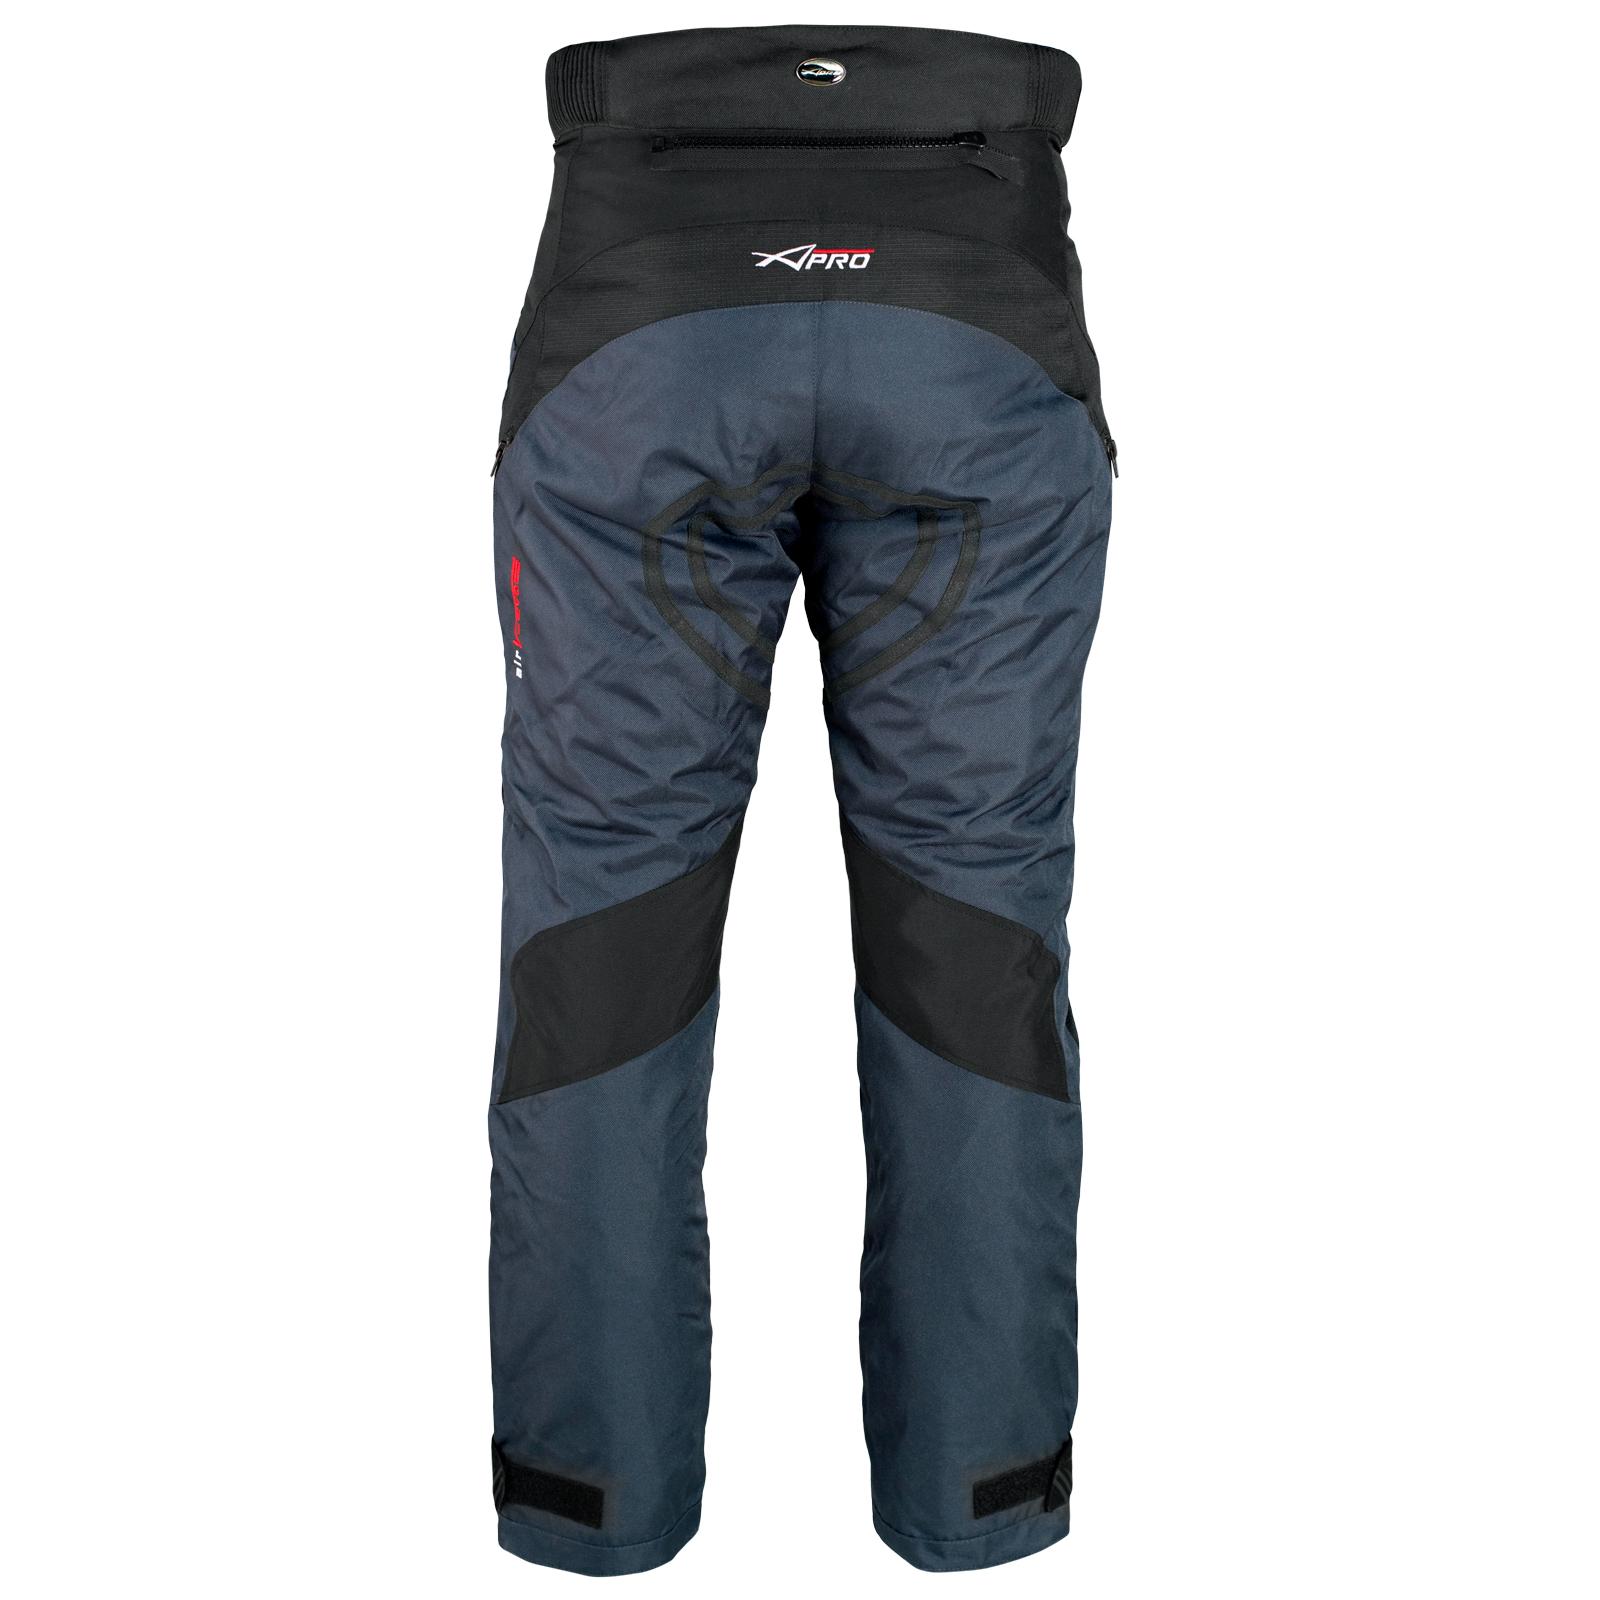 miniatuur 9 - Pantaloni Impermeabile Moto Imbottitura Termica Estraibile Traspirante Cordura